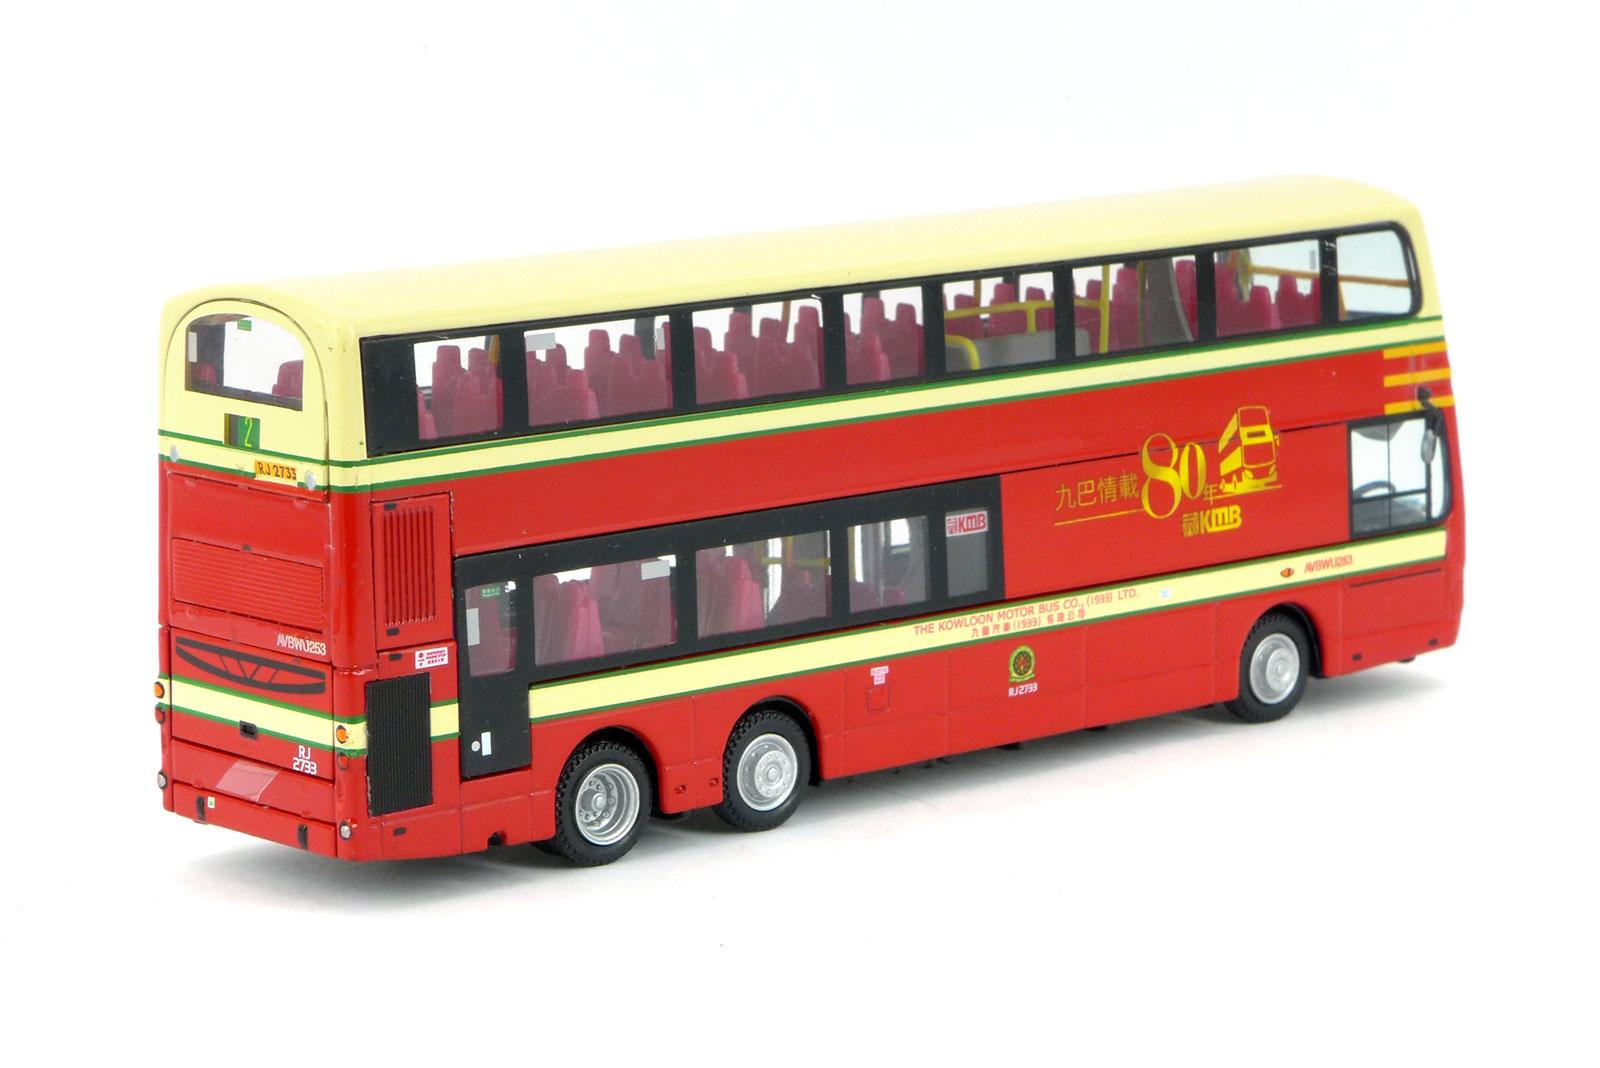 DW10523 - Kowloon Motor Bus - Wrights Gemini 2 bodied Volvo B9TL